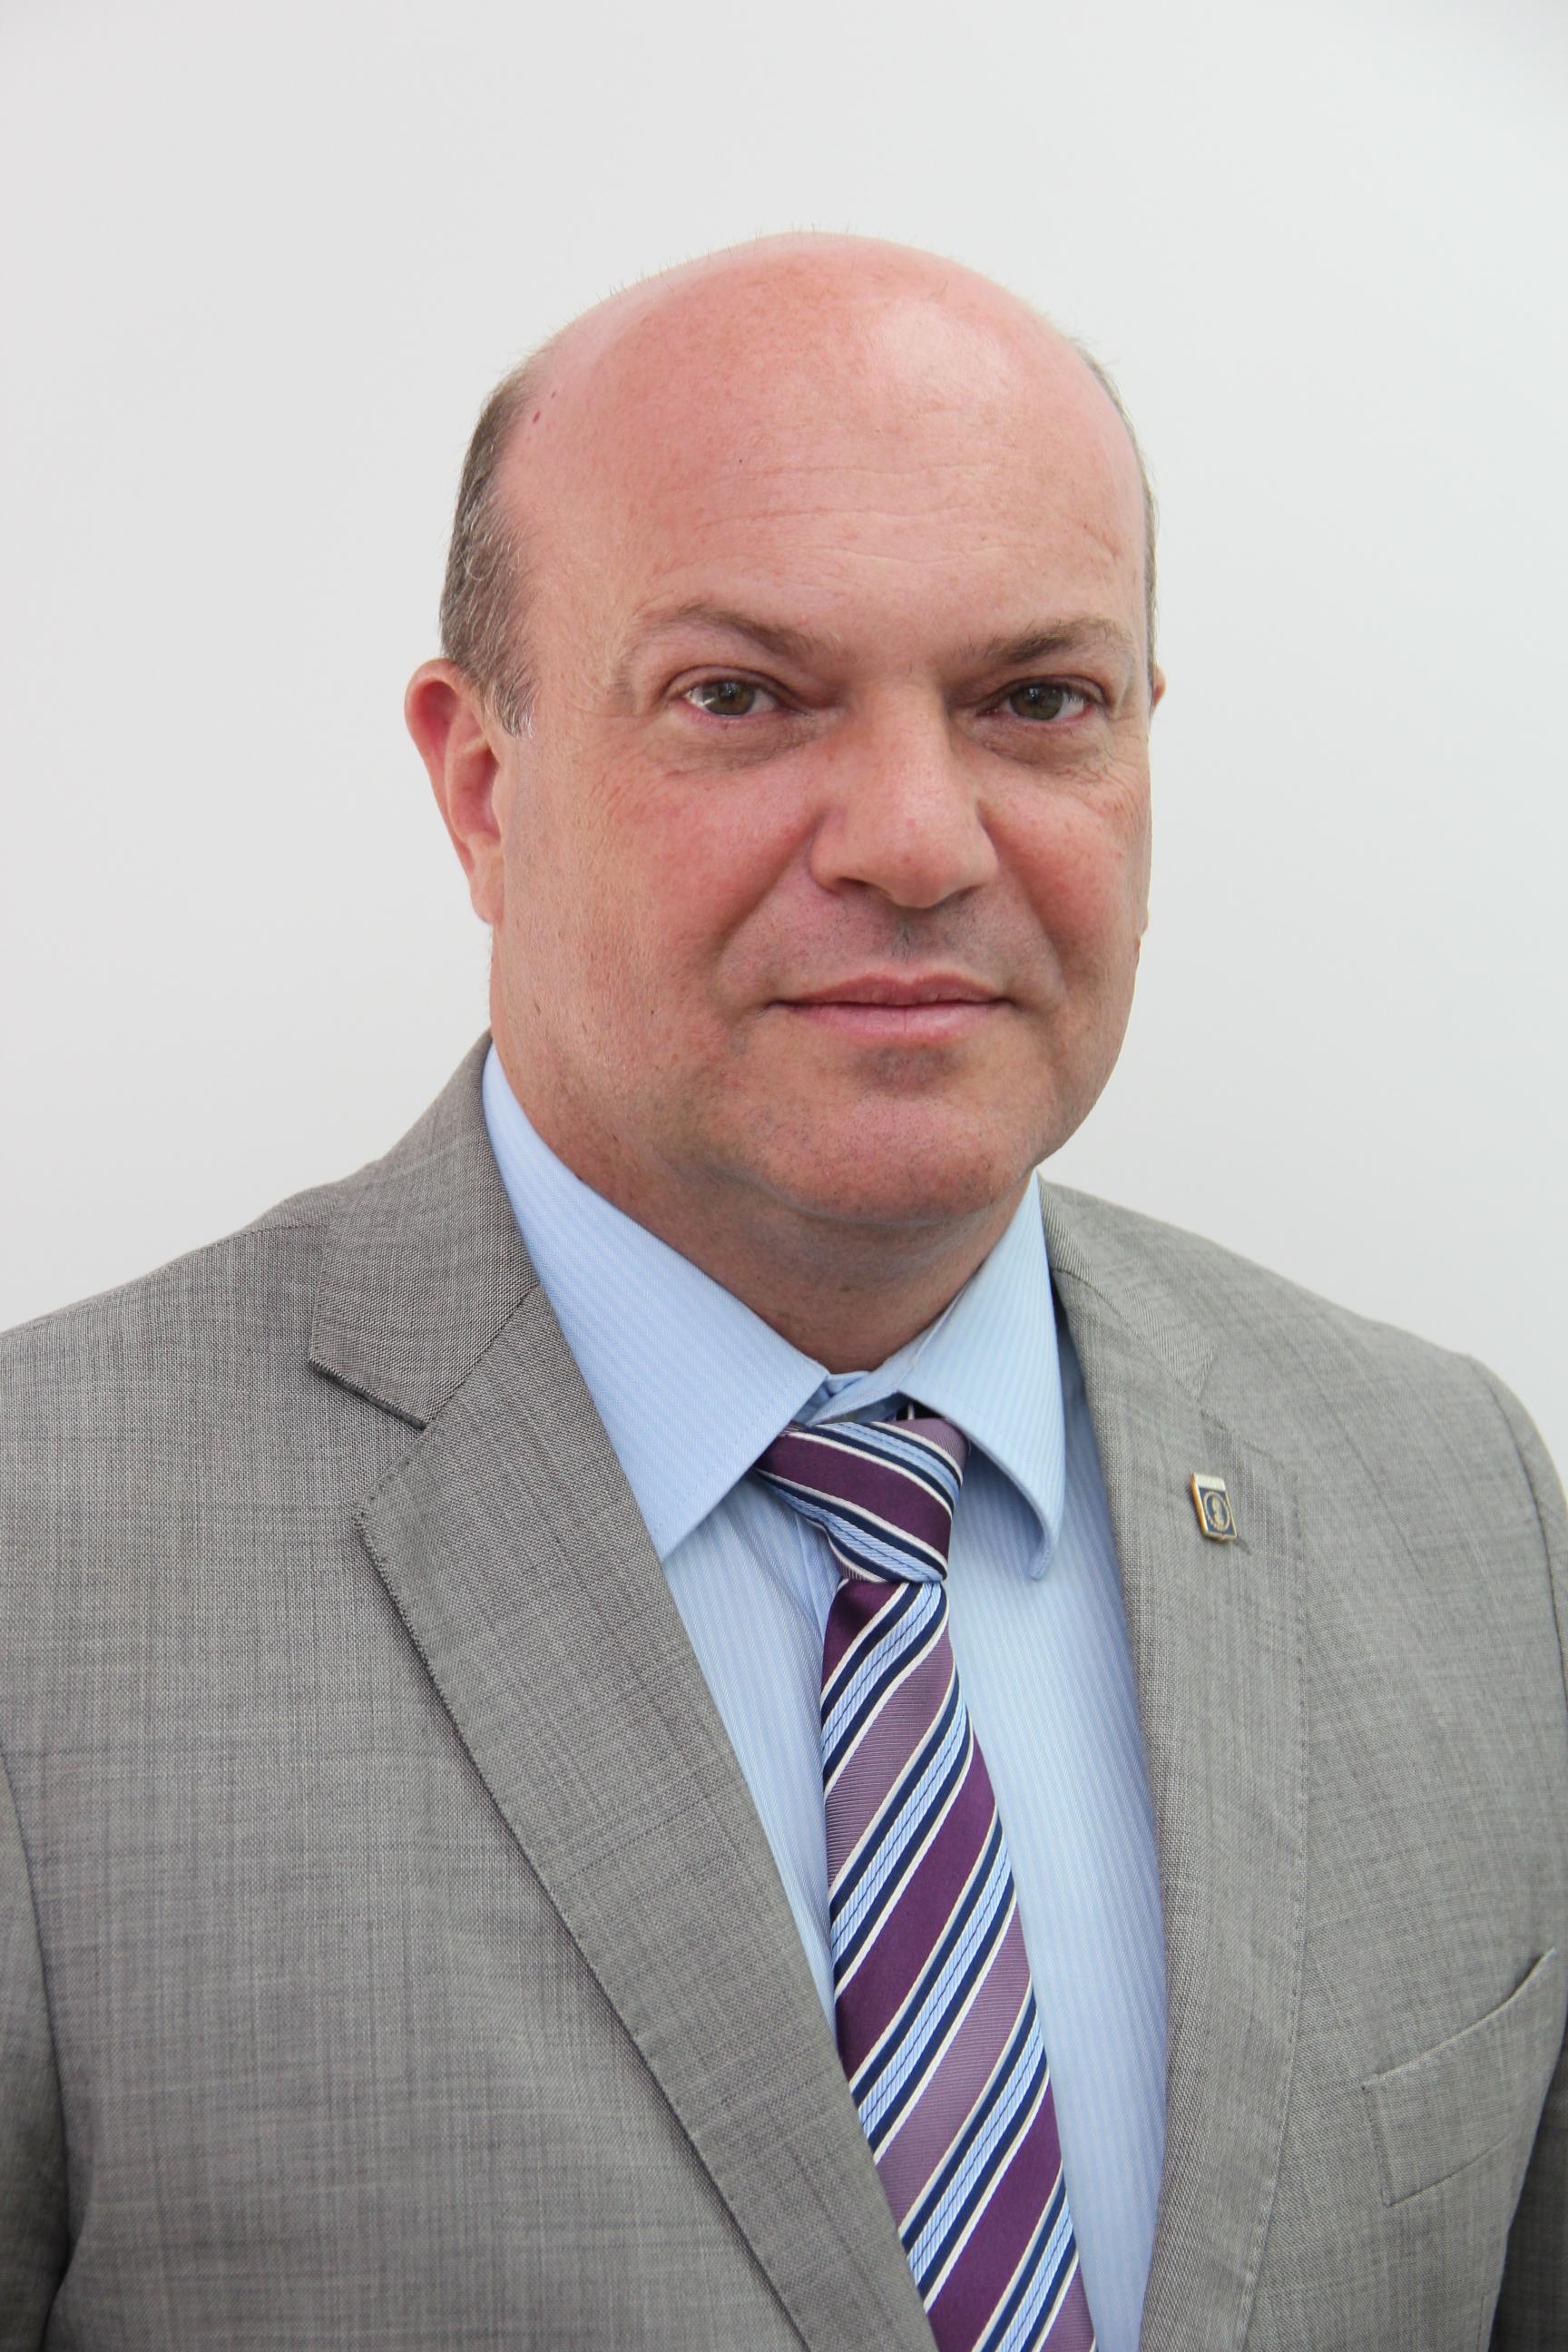 Carlos Alberto Kita Xavier